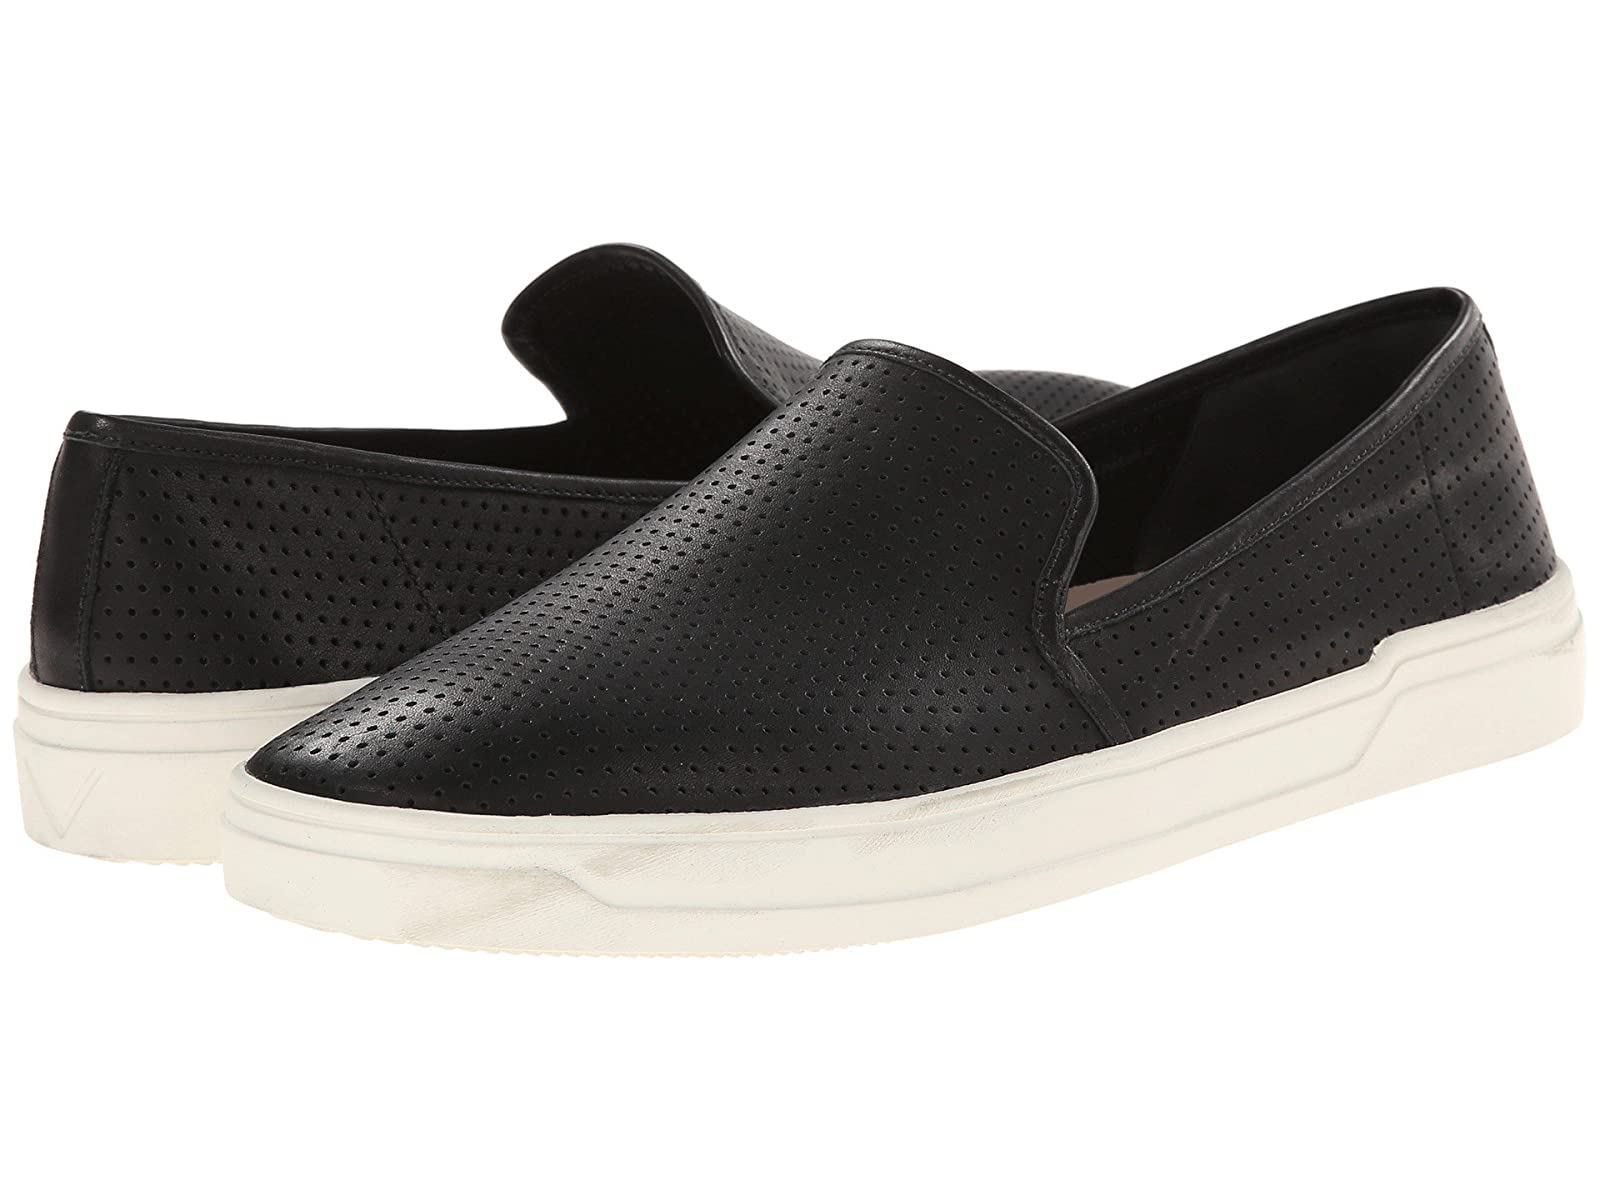 Via Spiga Galea 5Atmospheric grades have affordable shoes